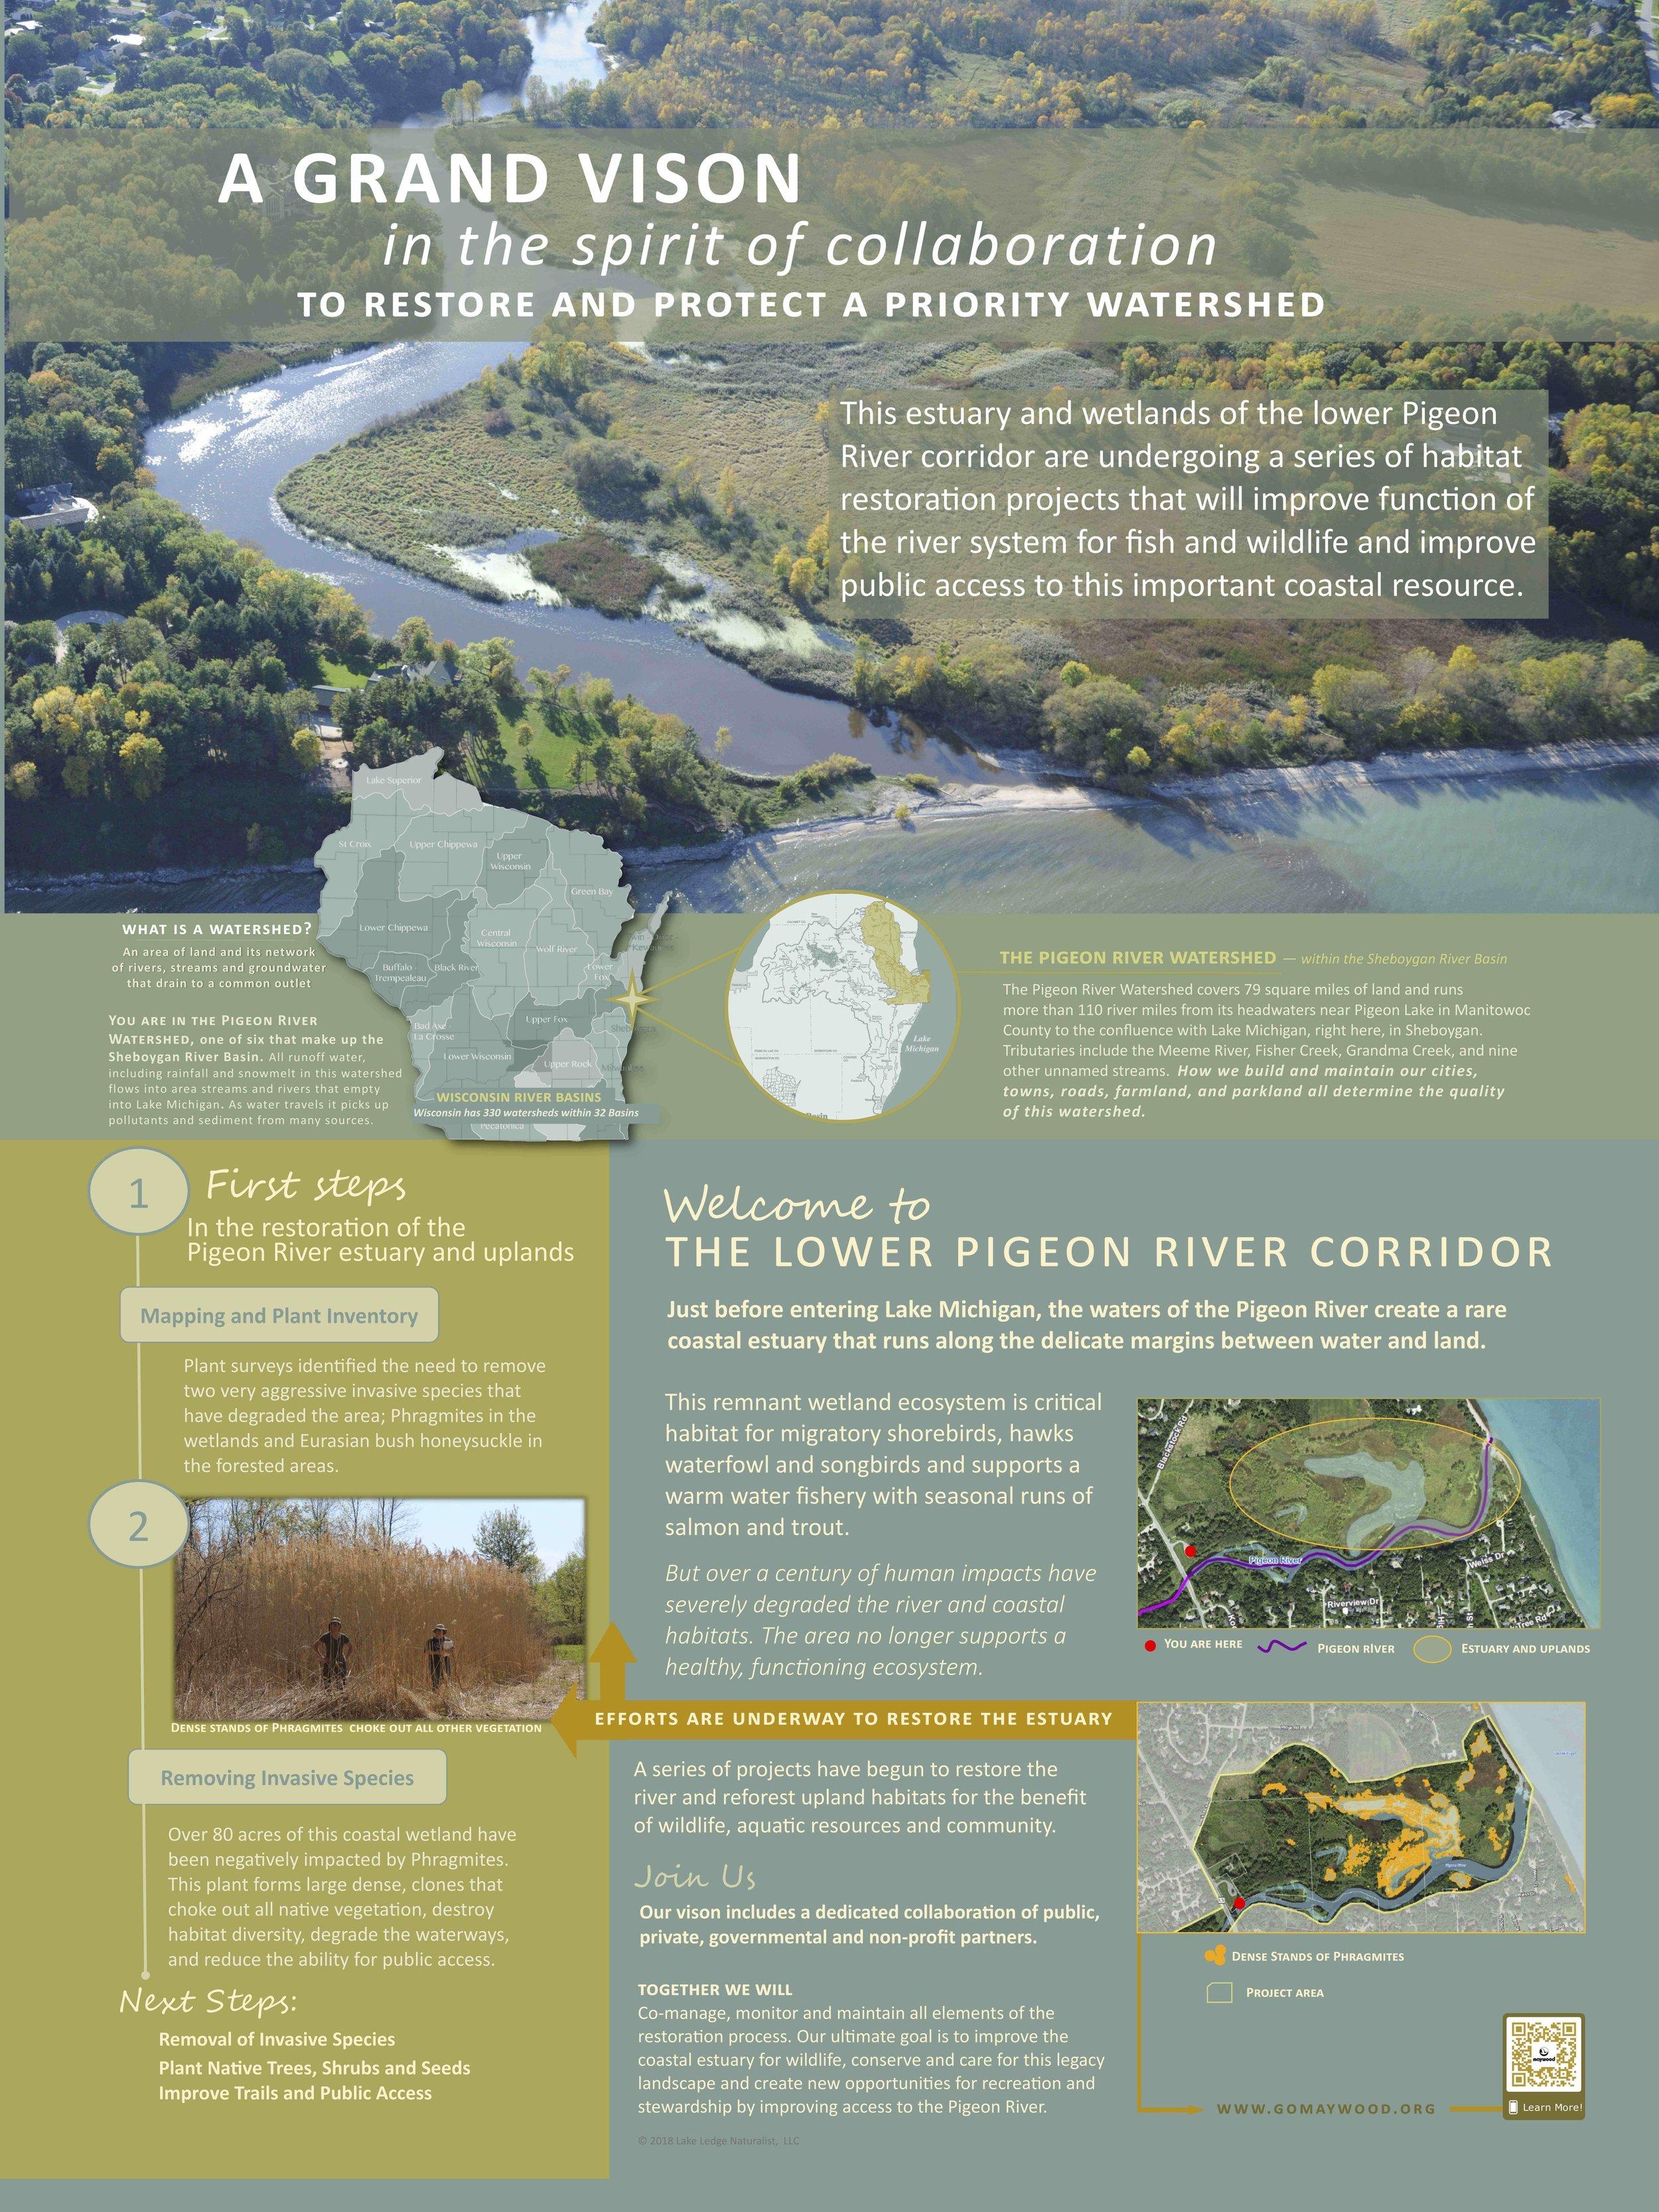 Pigeon River Estuary Restoration Project